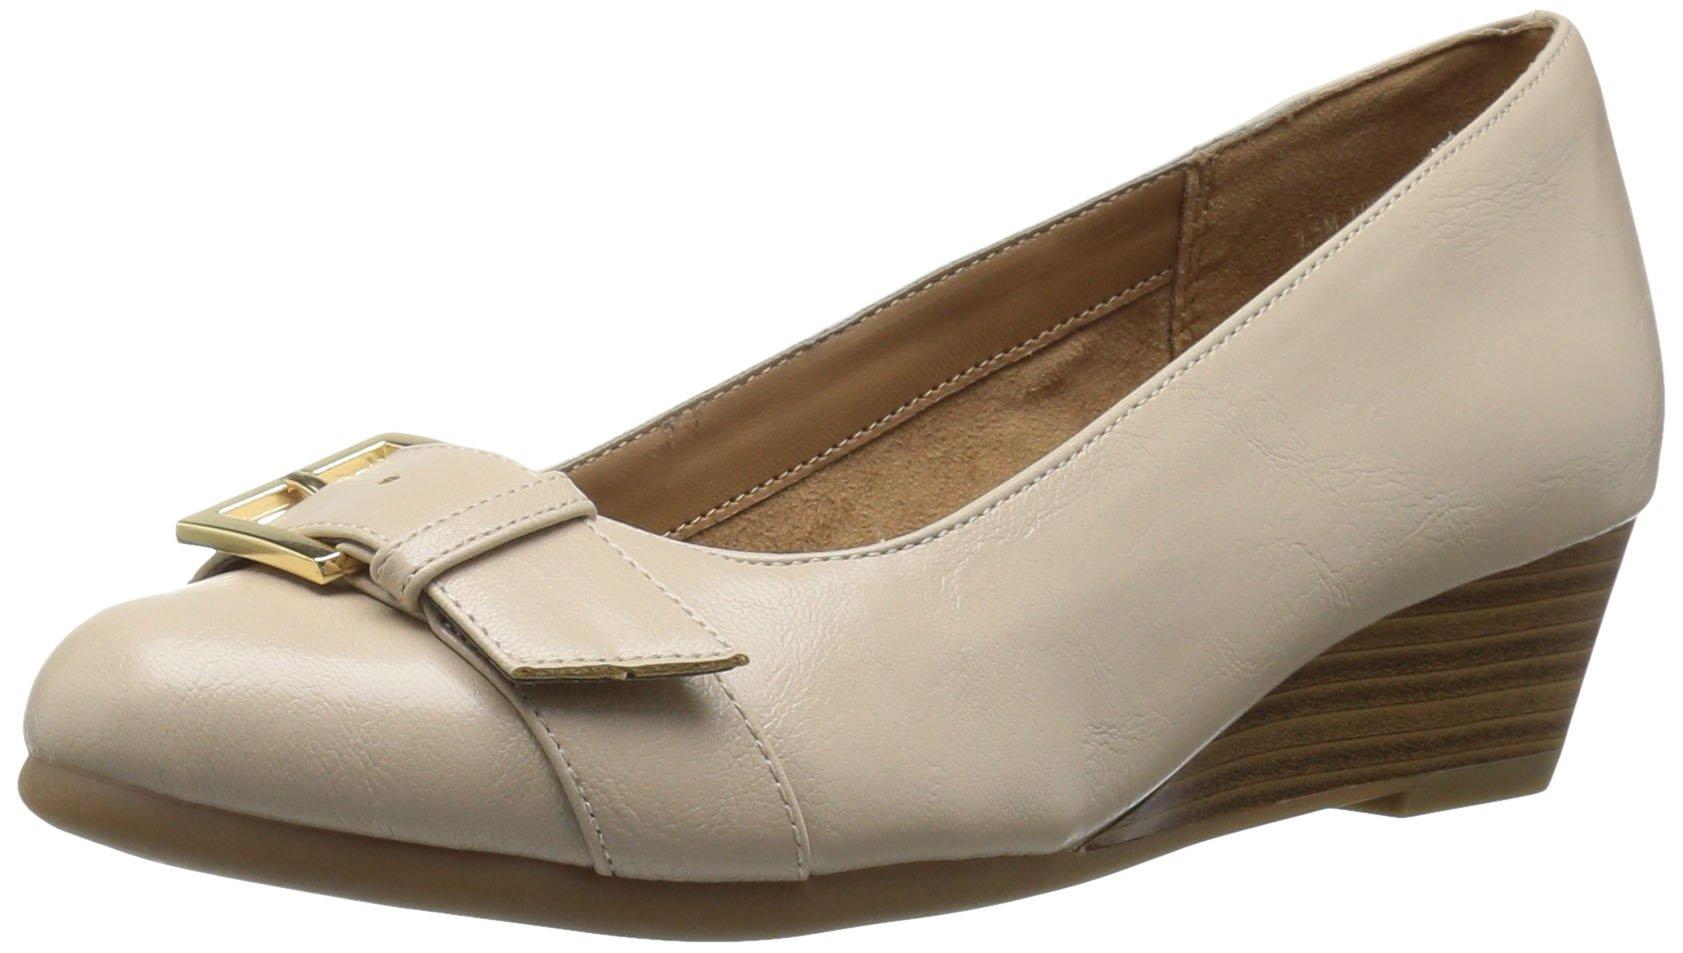 Aerosoles Women's Love Bug Slip-on Loafer, Bone, 8 M US